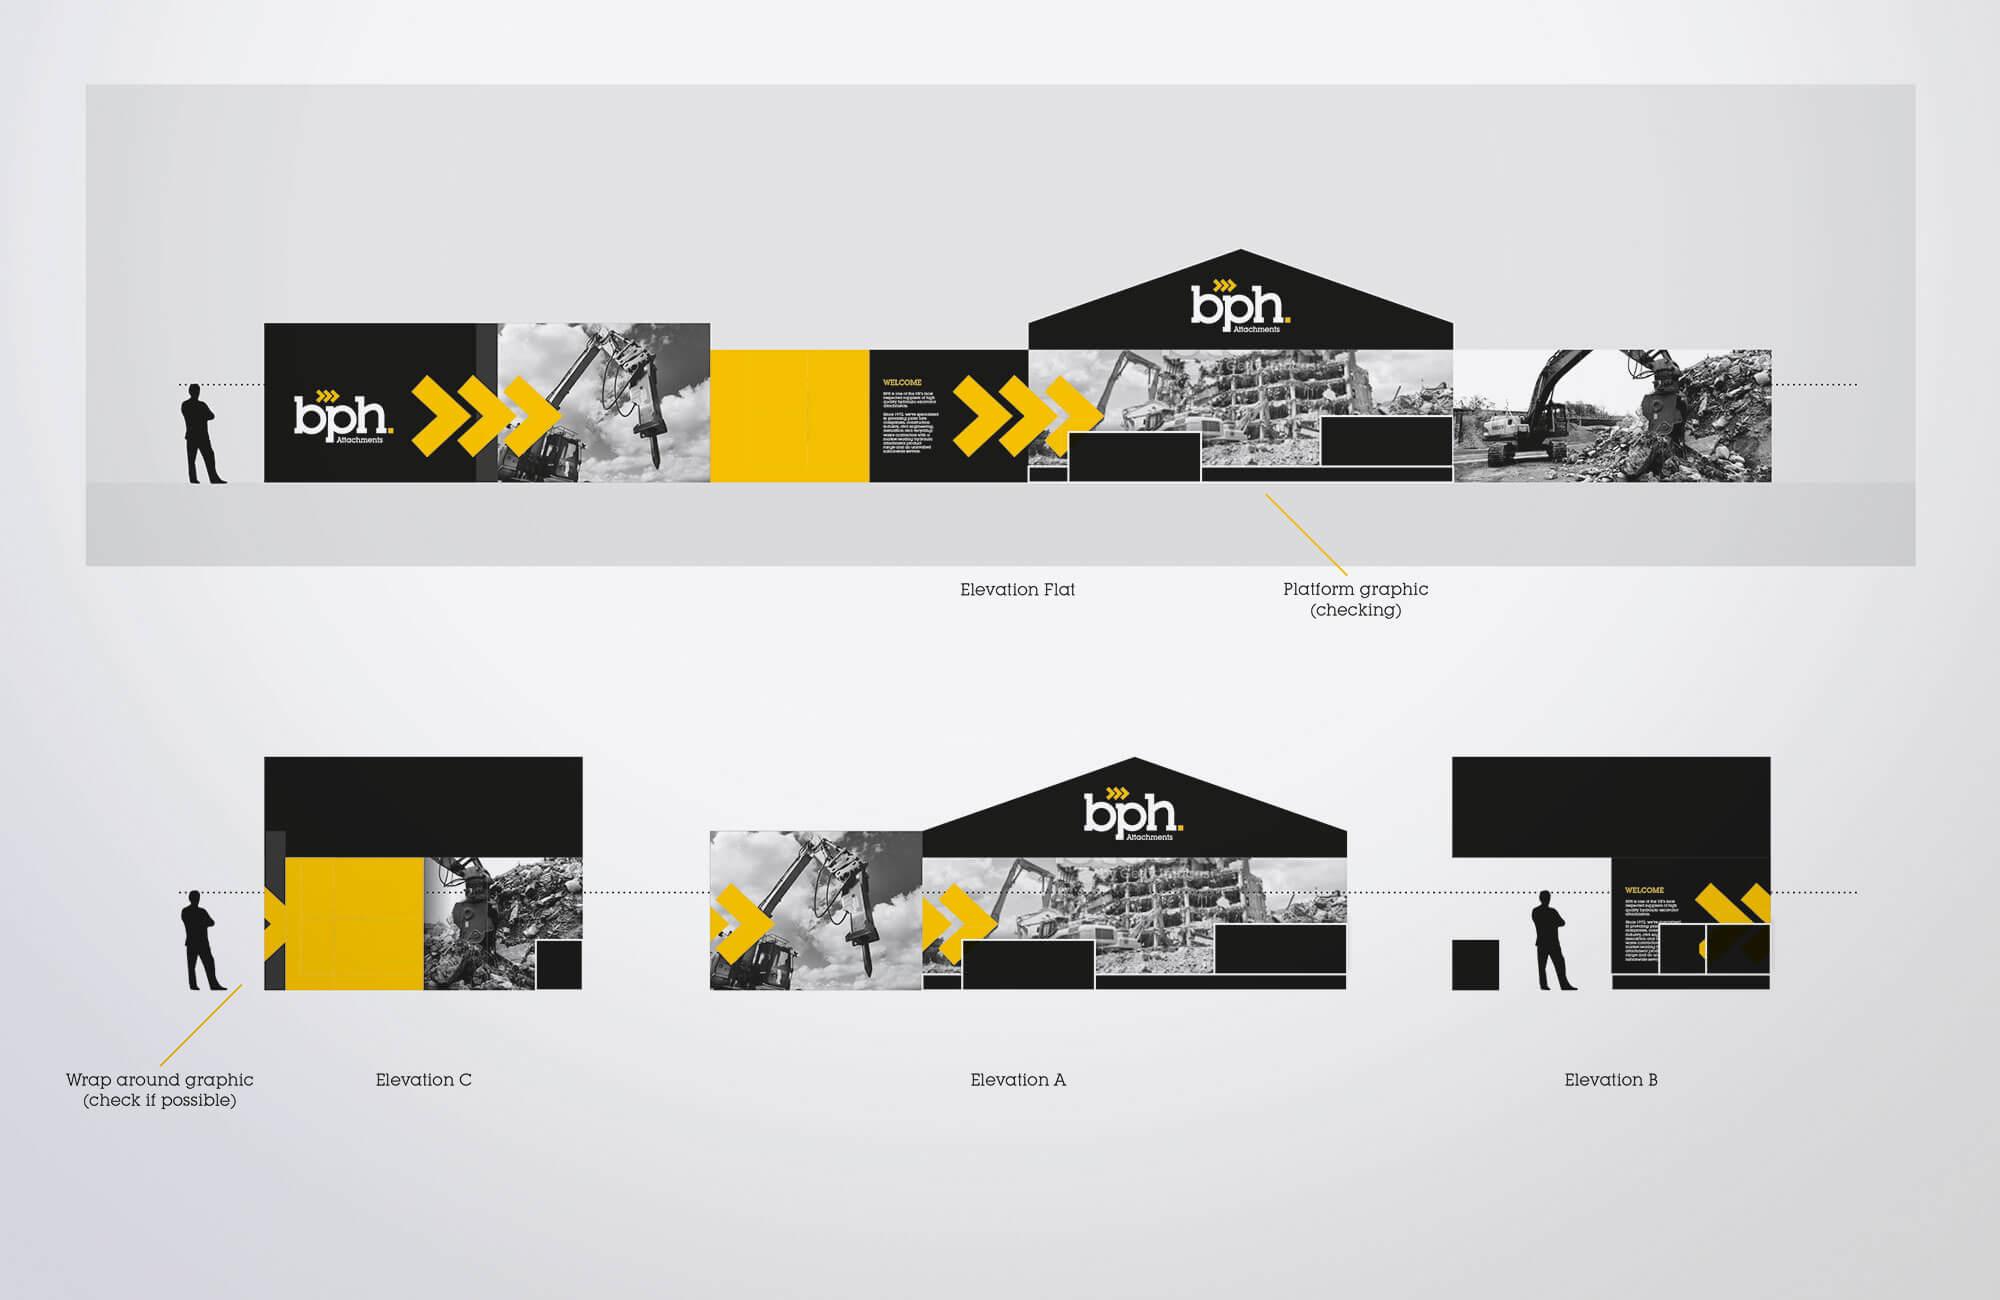 BPH Exhibition Stand Design Visual